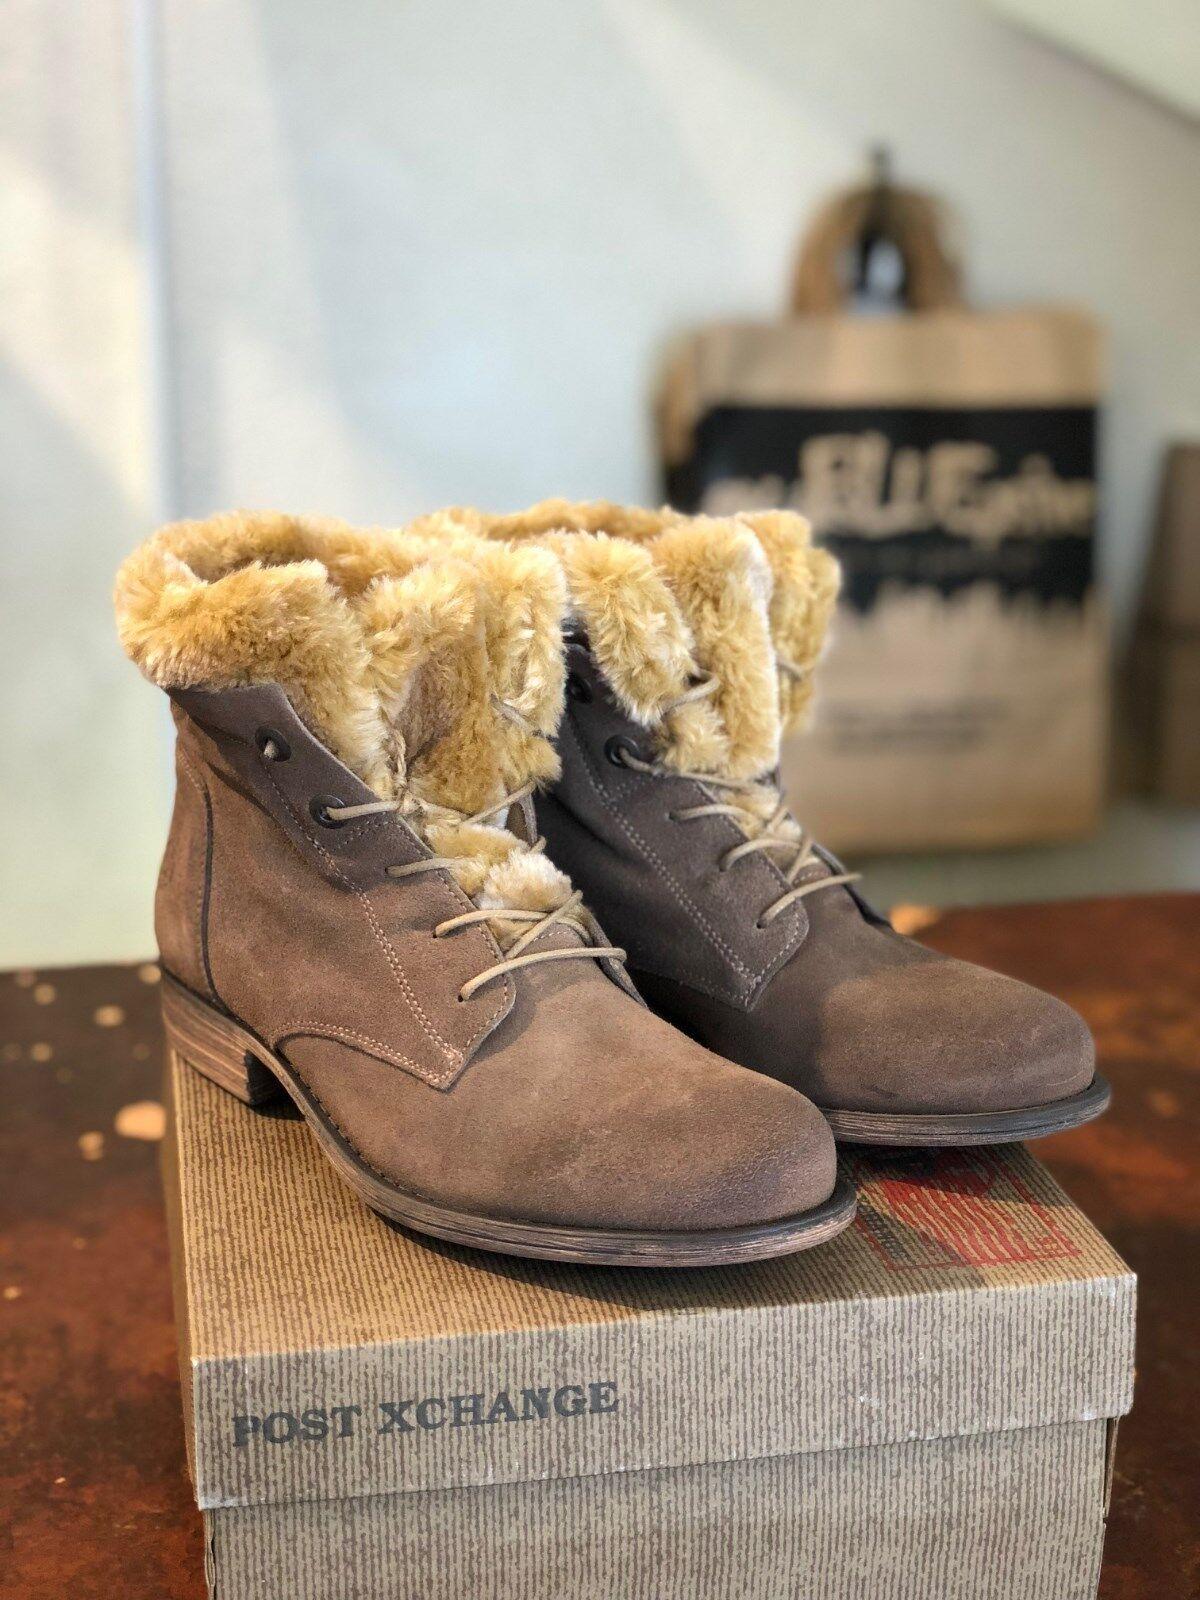 Damen Schuhe Schnürstiefelette Post Xchange Jessy 800 Taupe EU Größe 40 OP 99,90 EU Taupe 25d86c